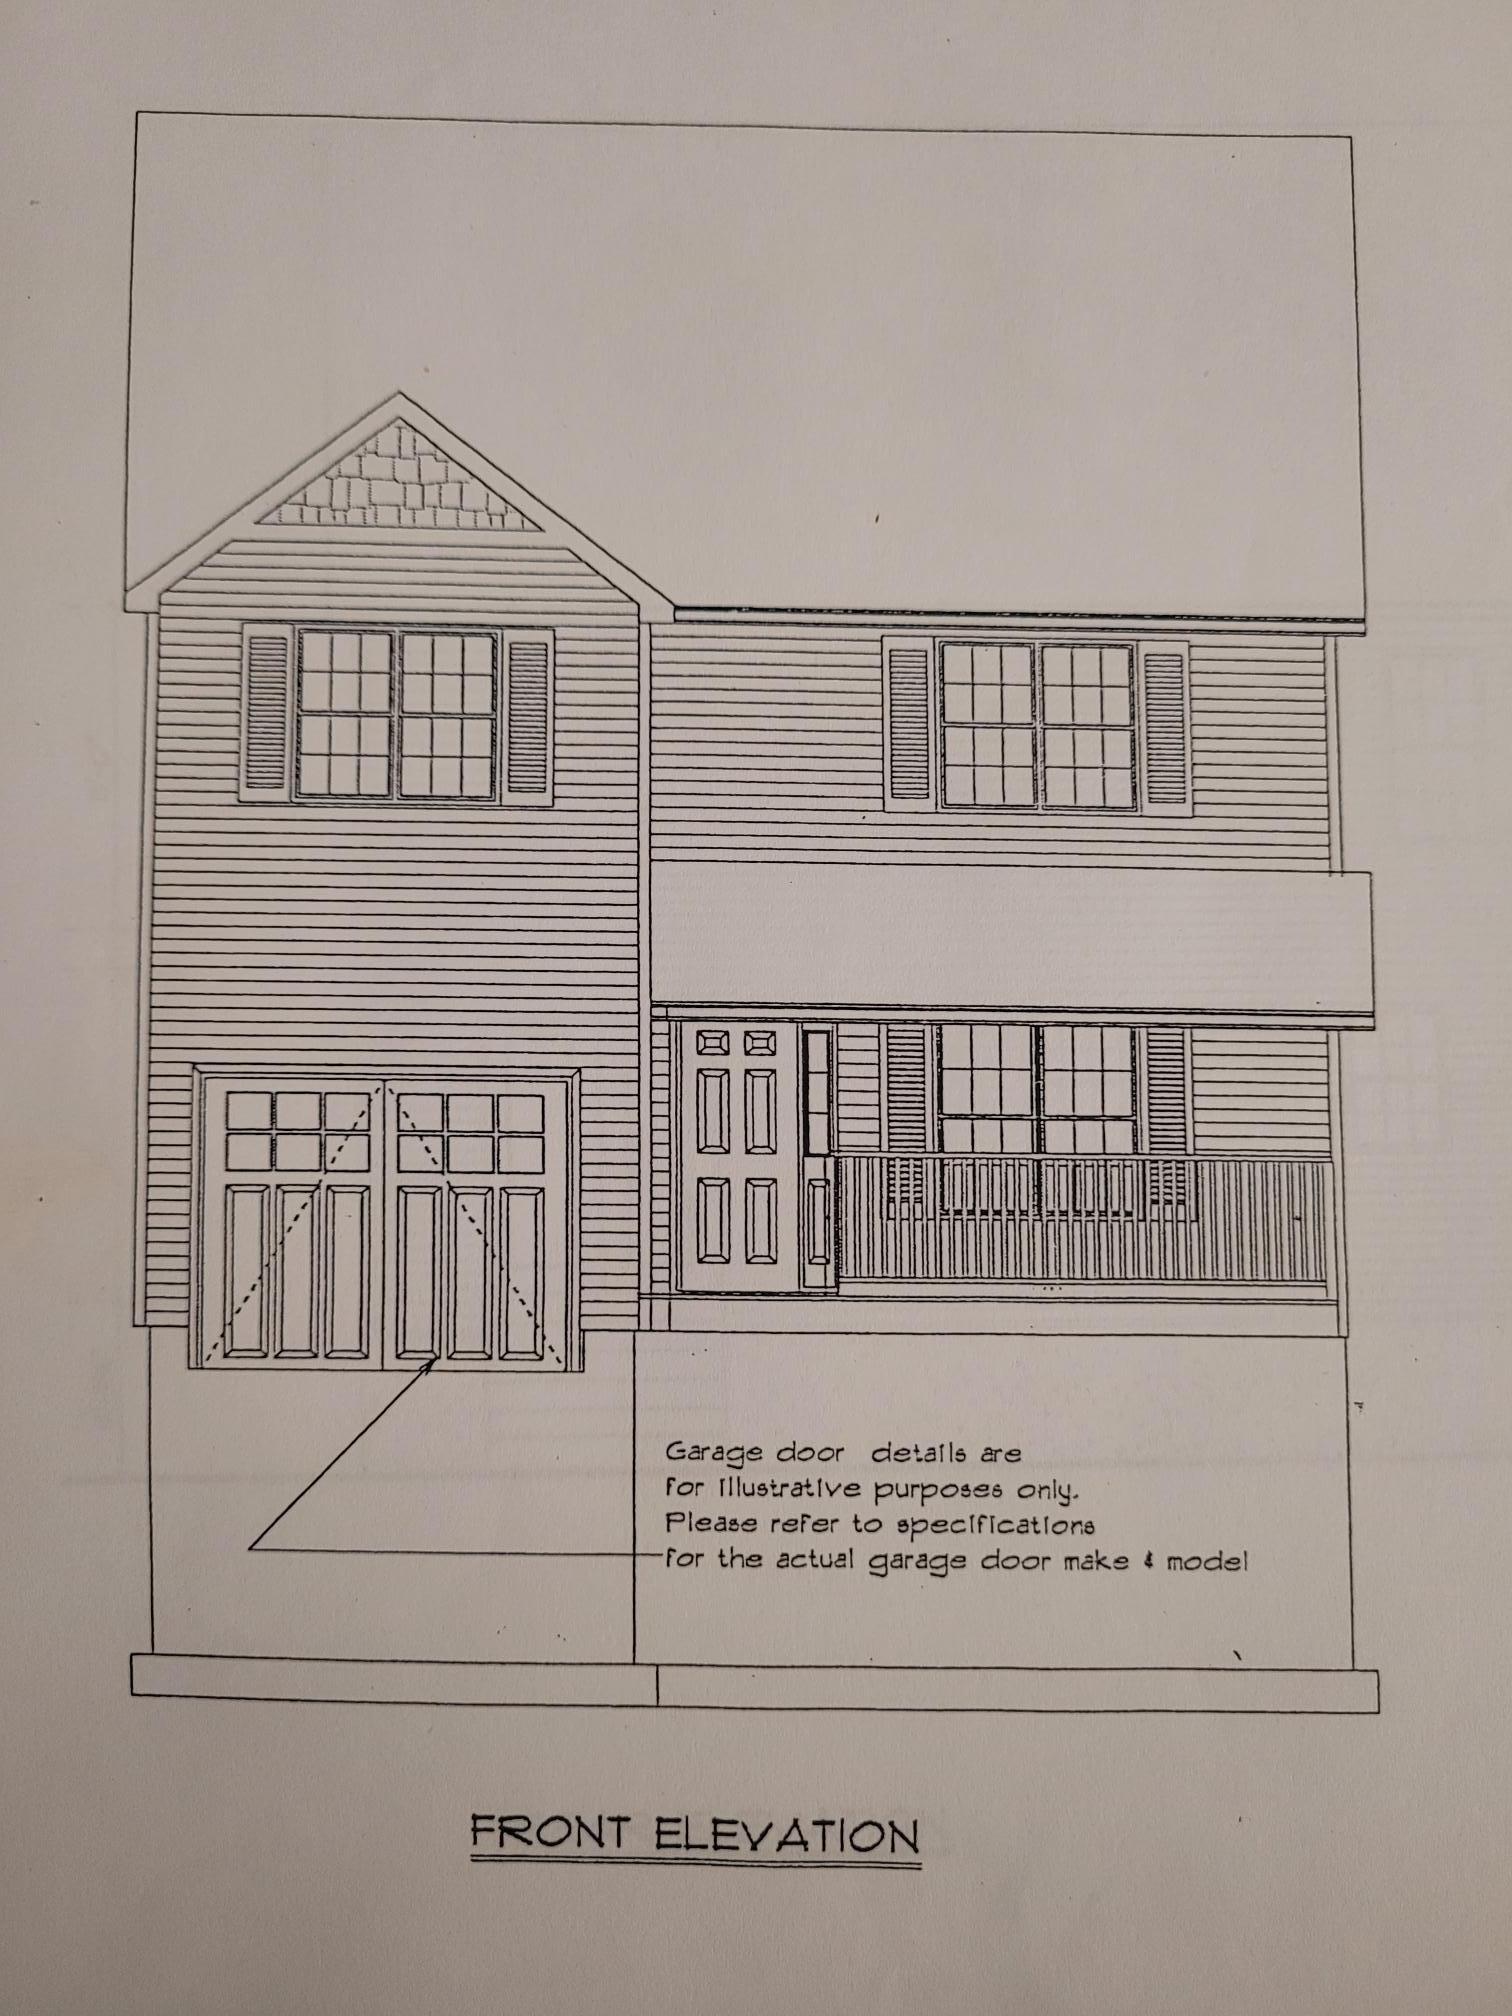 Property Image for 501 Kenyon Ave